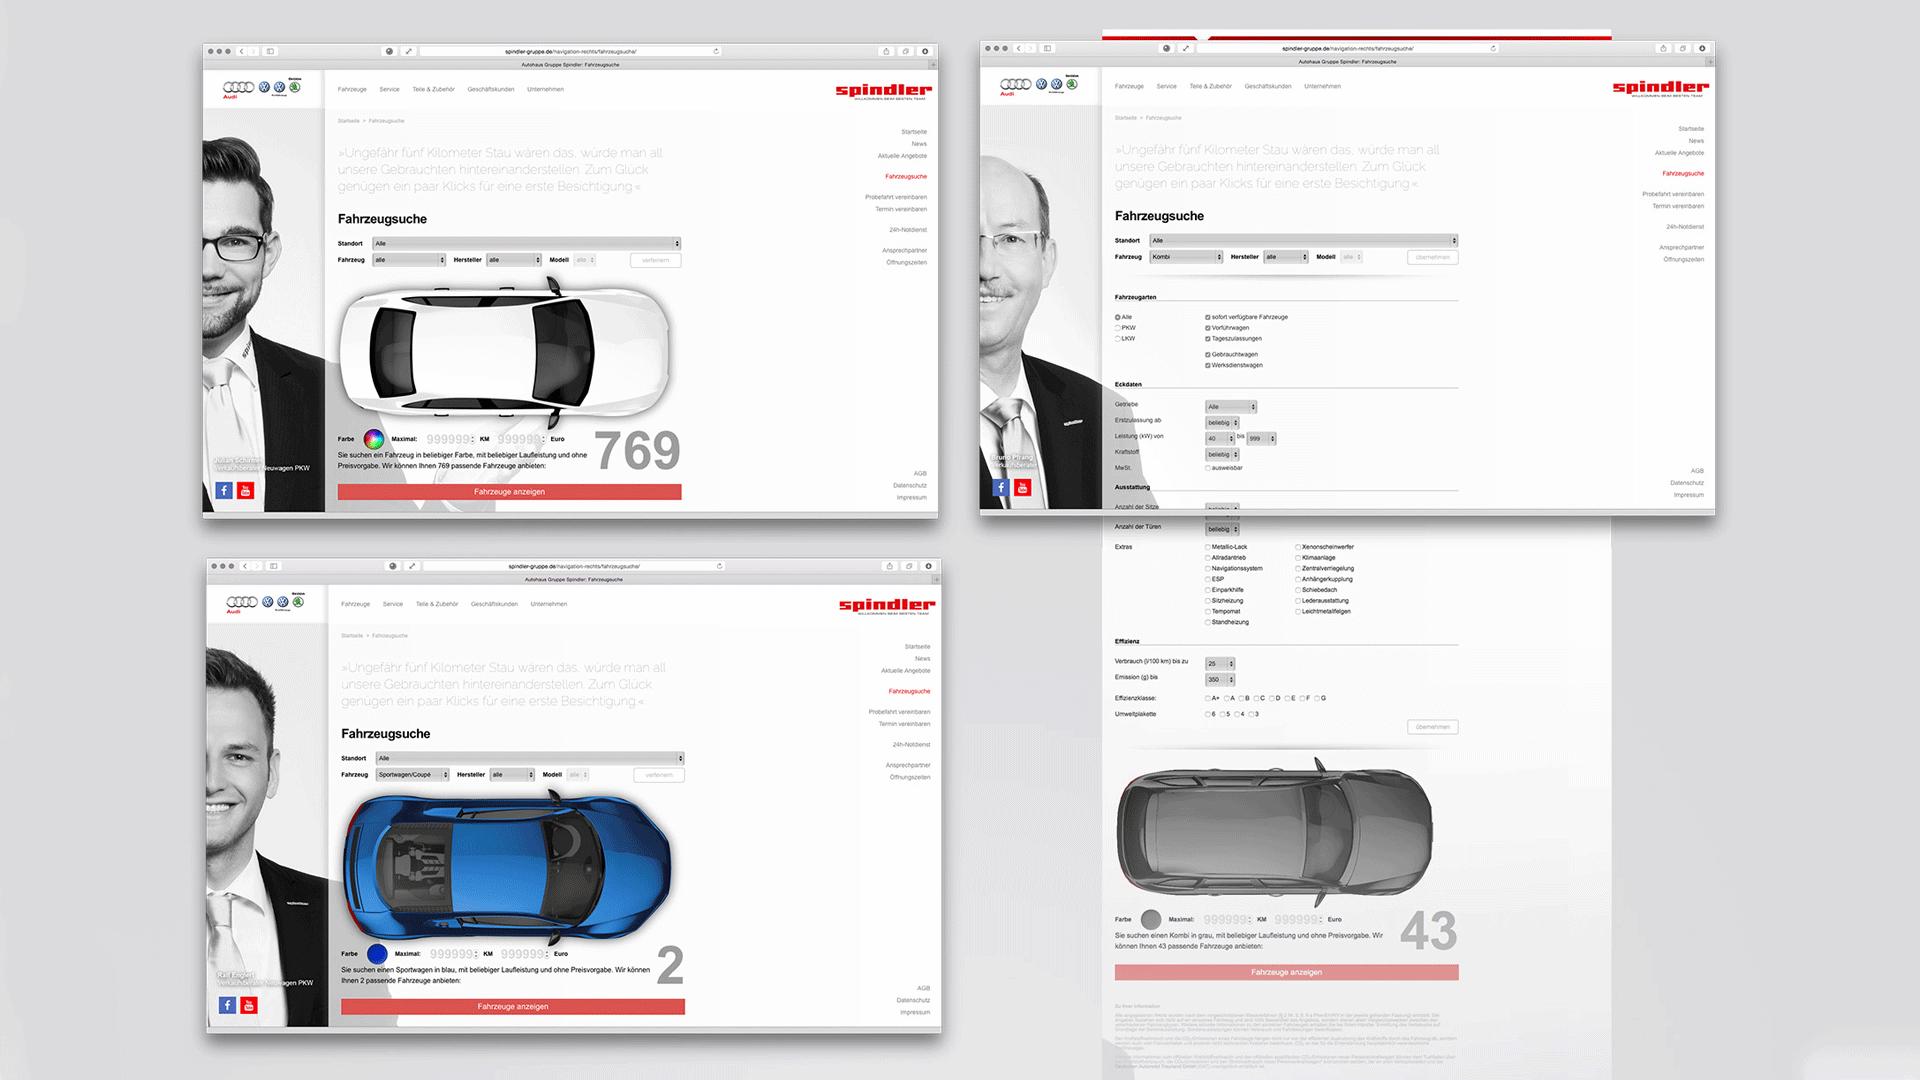 Gerryland-Referenz-Spindler-Website-Fahrzeugsuche